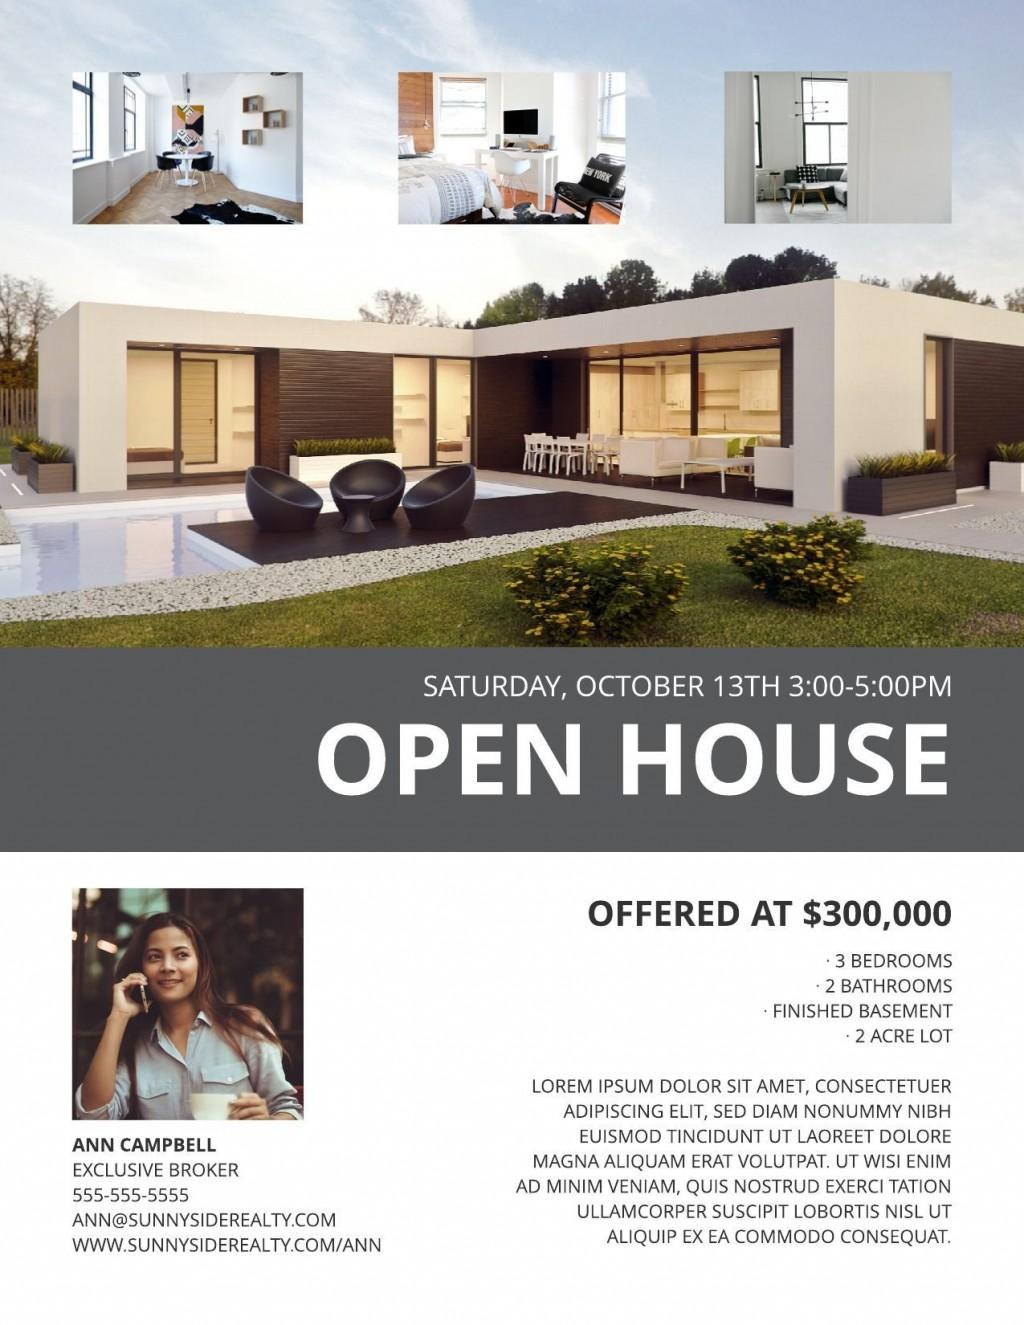 003 Best Open House Flyer Template Design  Templates Word Free School MicrosoftLarge